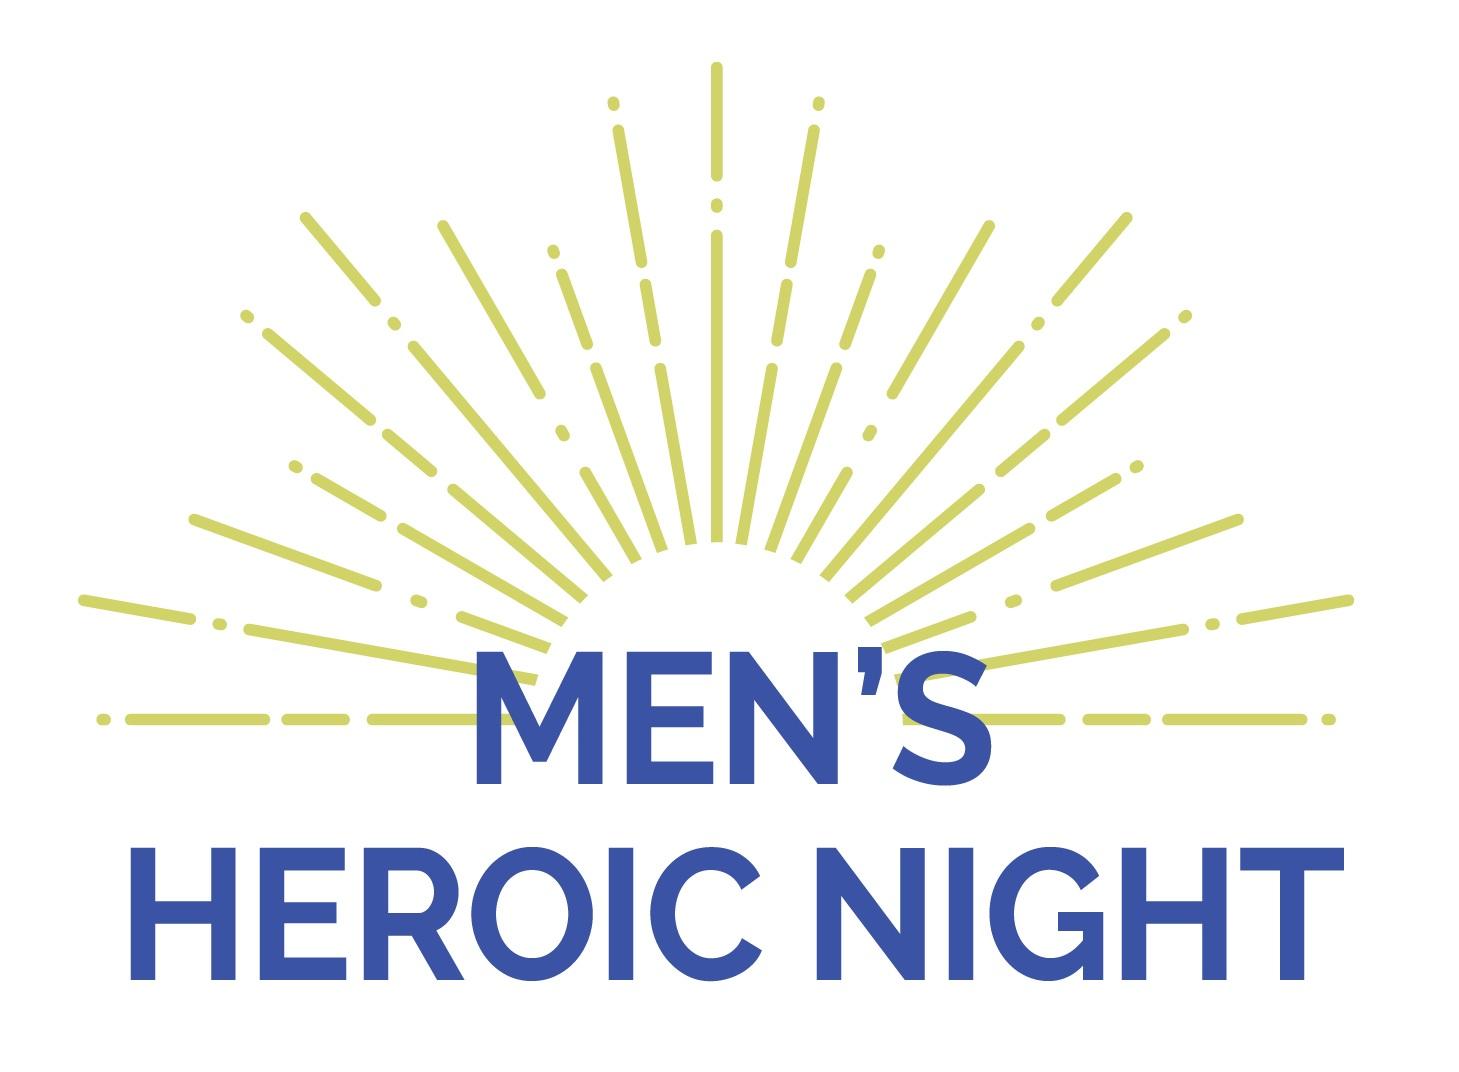 Men%27s+Heroic+Night.jpg